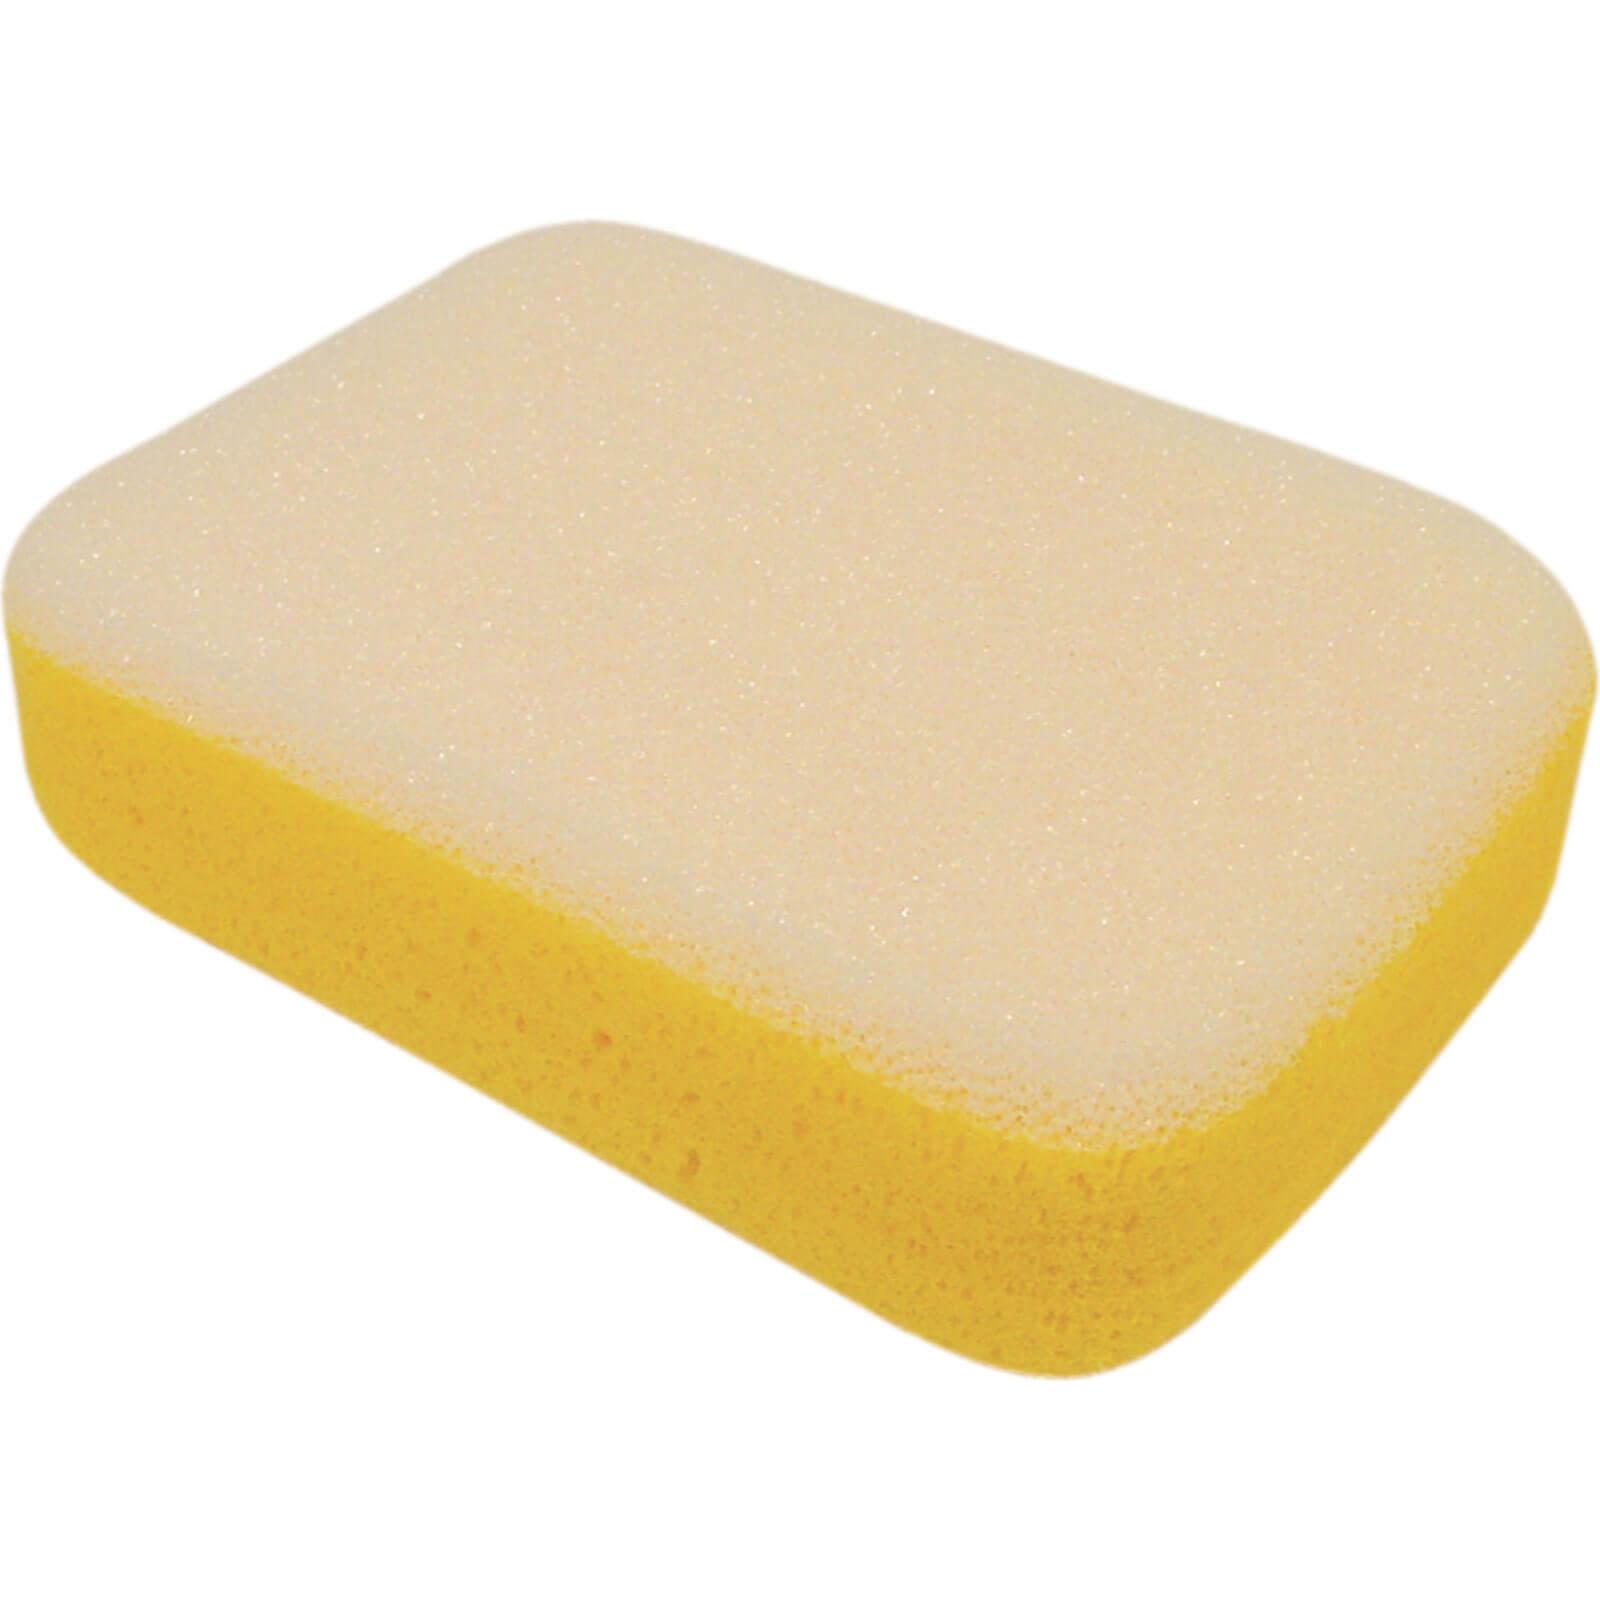 Image of Vitrex Grouting Sponge